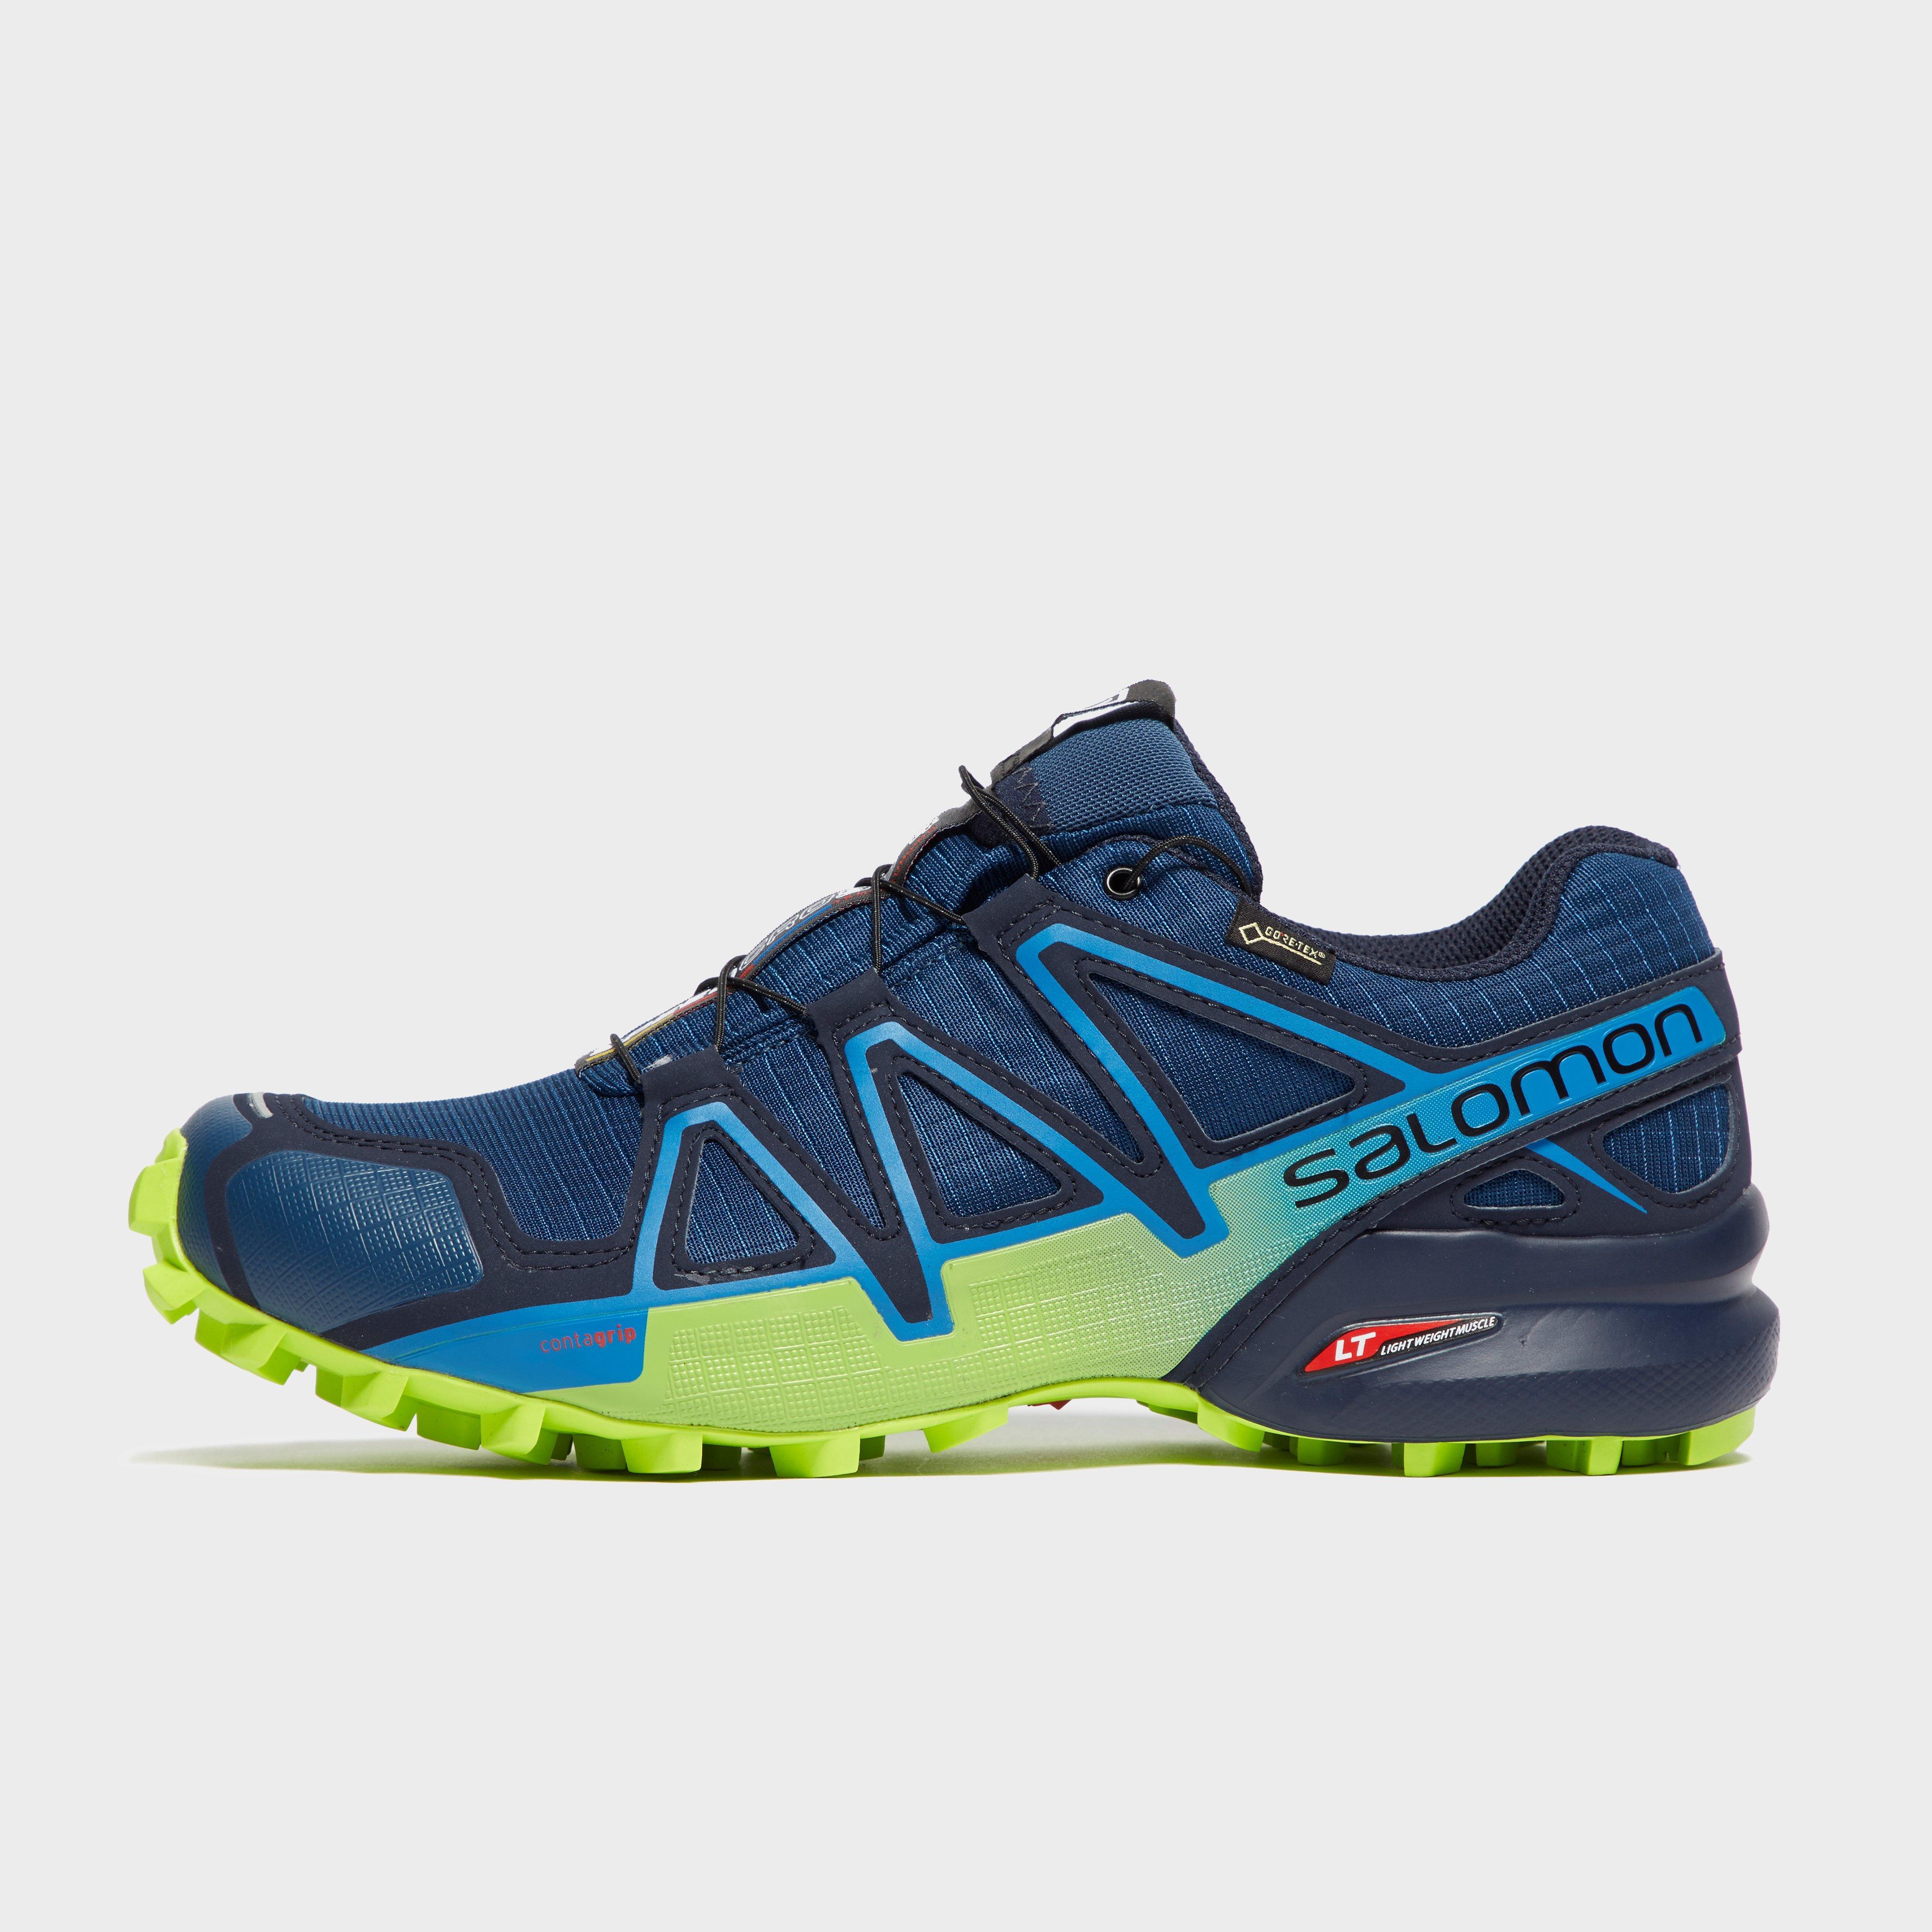 c52f4878d8f8 Salomon Men s Speedcross 4 CS GORE-TEX® Trail Running Shoes image 1